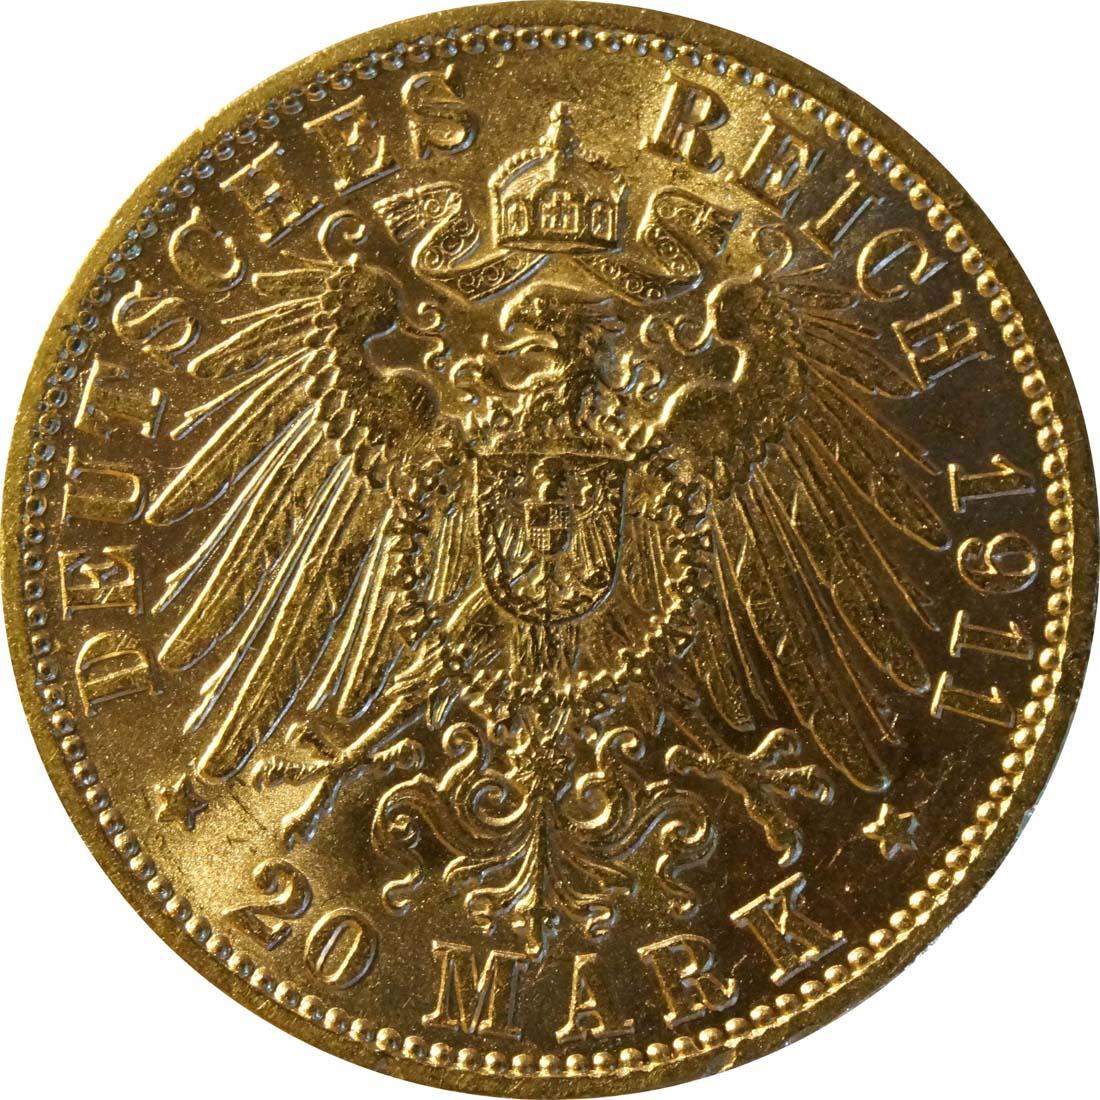 Rückseite :Deutschland : 20 Mark  winz. Rs. 1911 ss/vz.